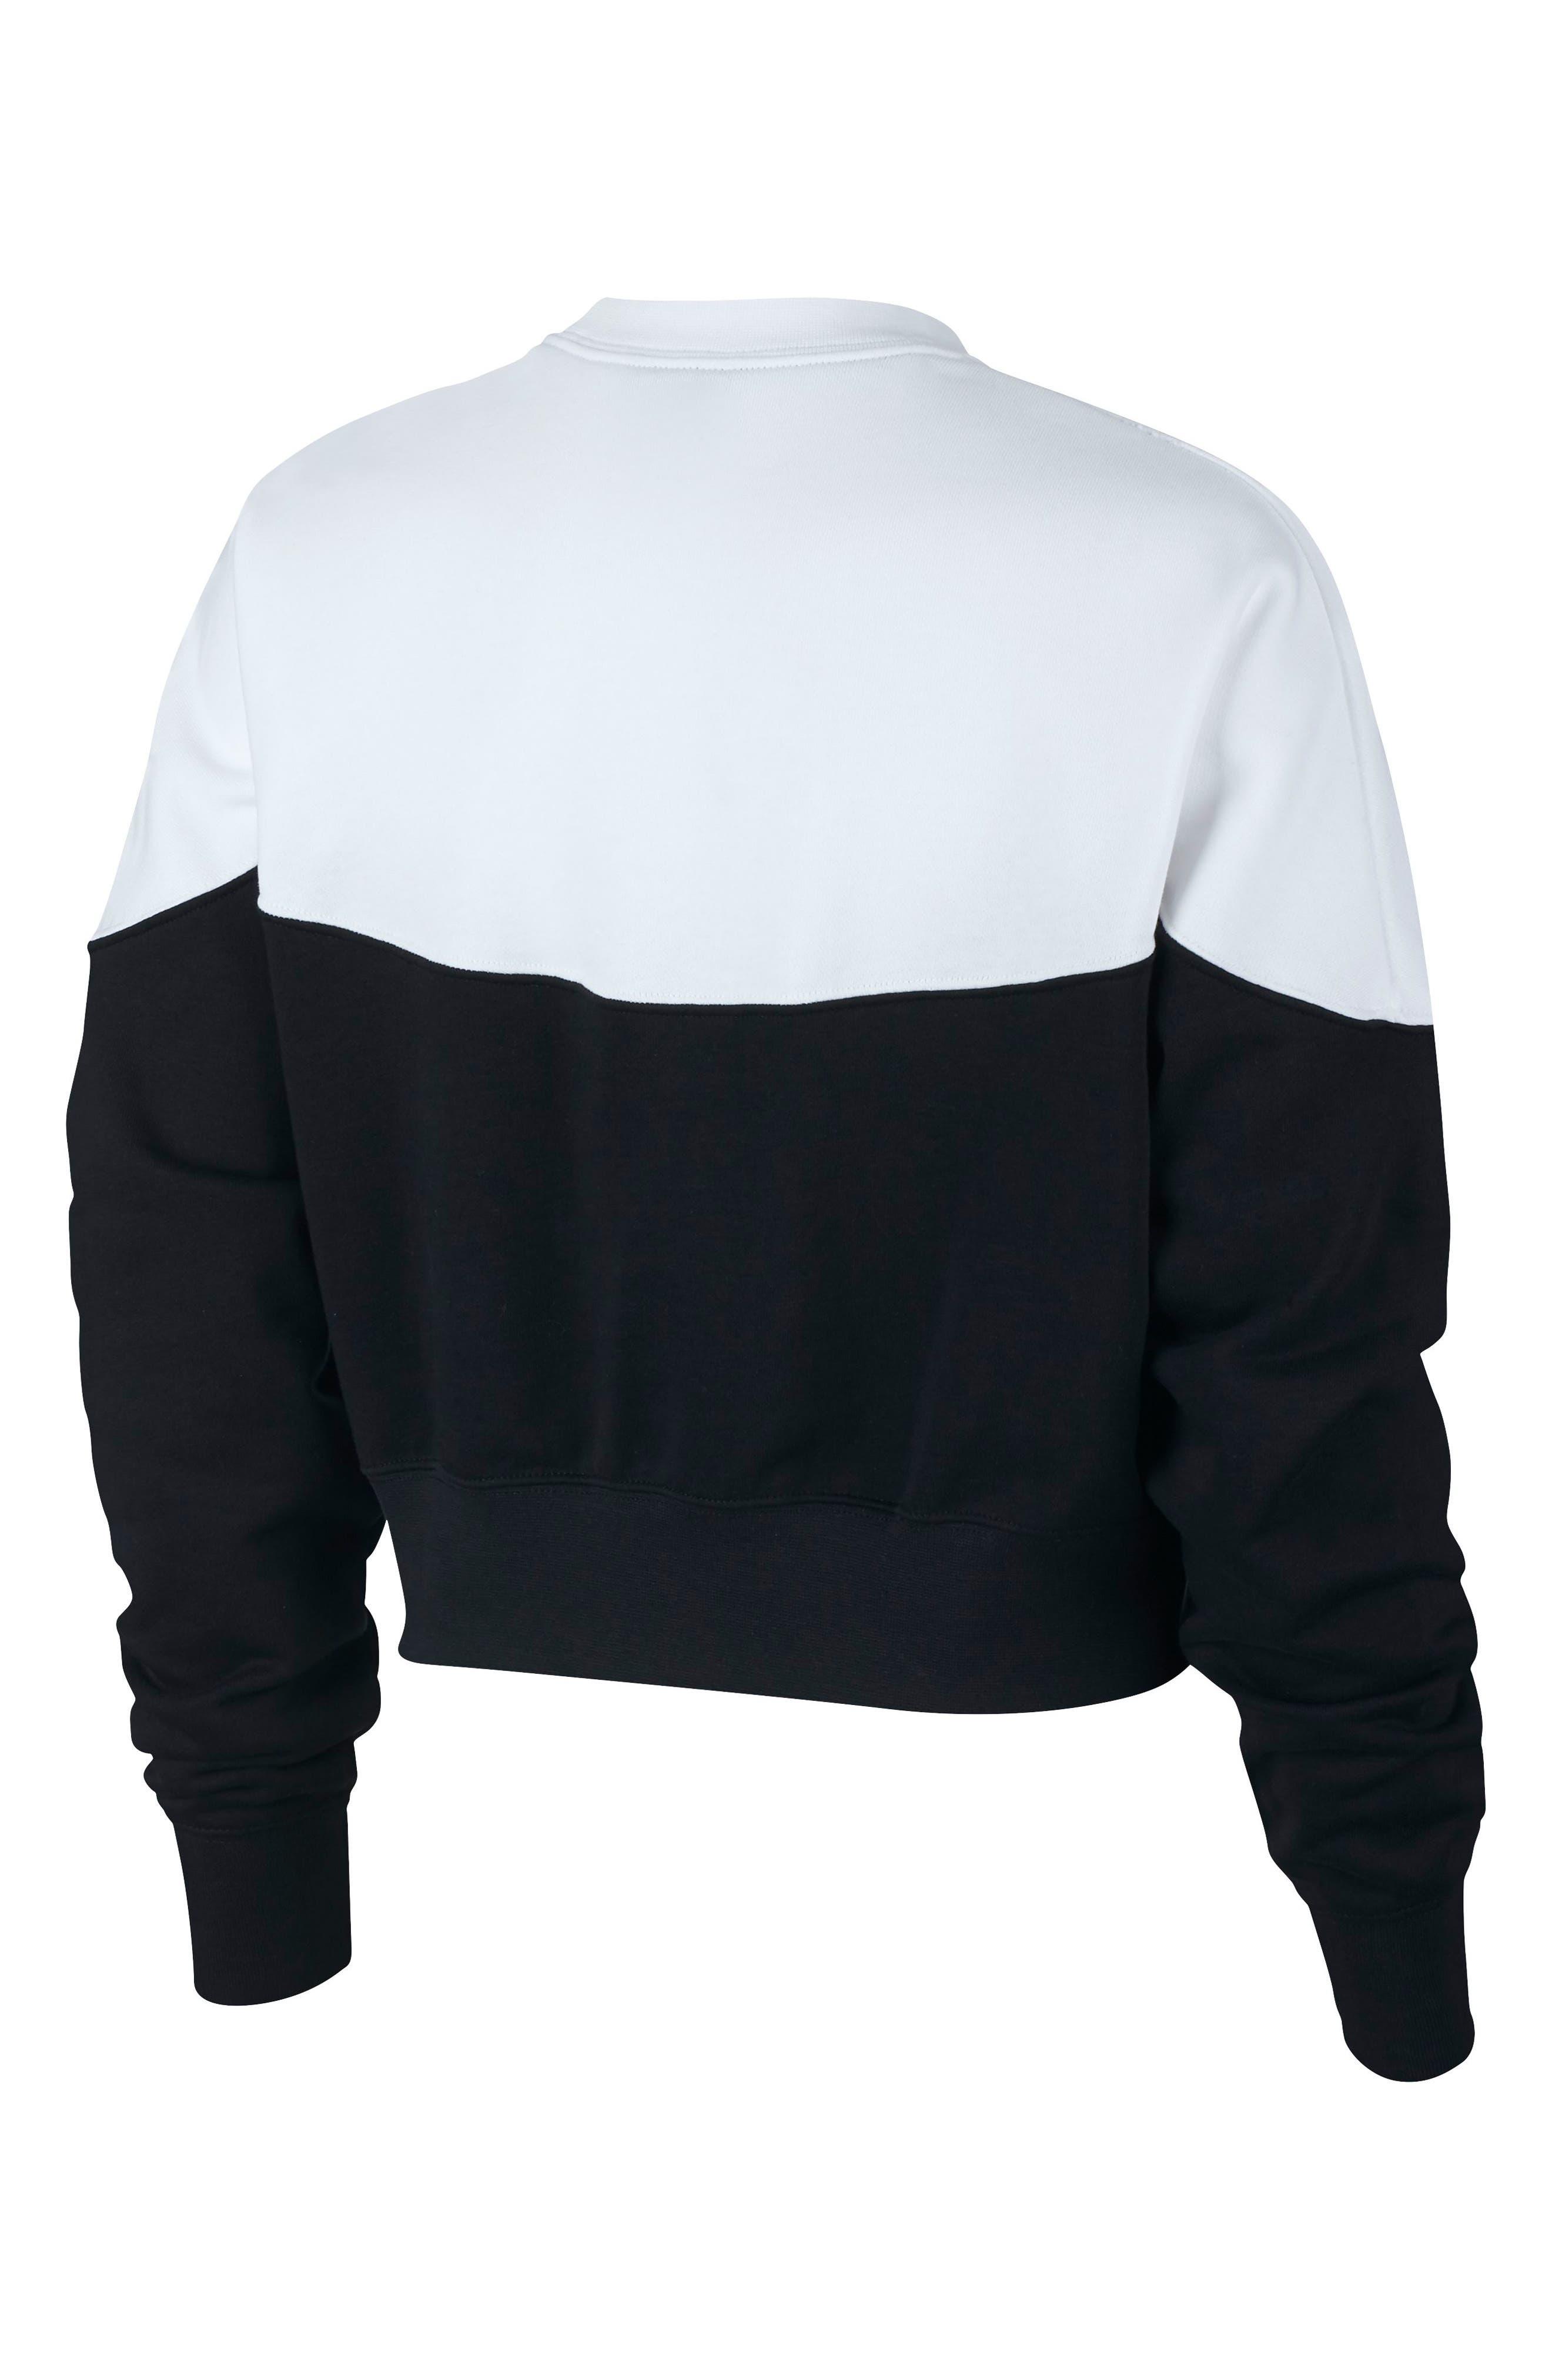 NIKE, Sportswear Heritage Fleece Sweatshirt, Alternate thumbnail 2, color, BLACK/ WHITE/ BLACK